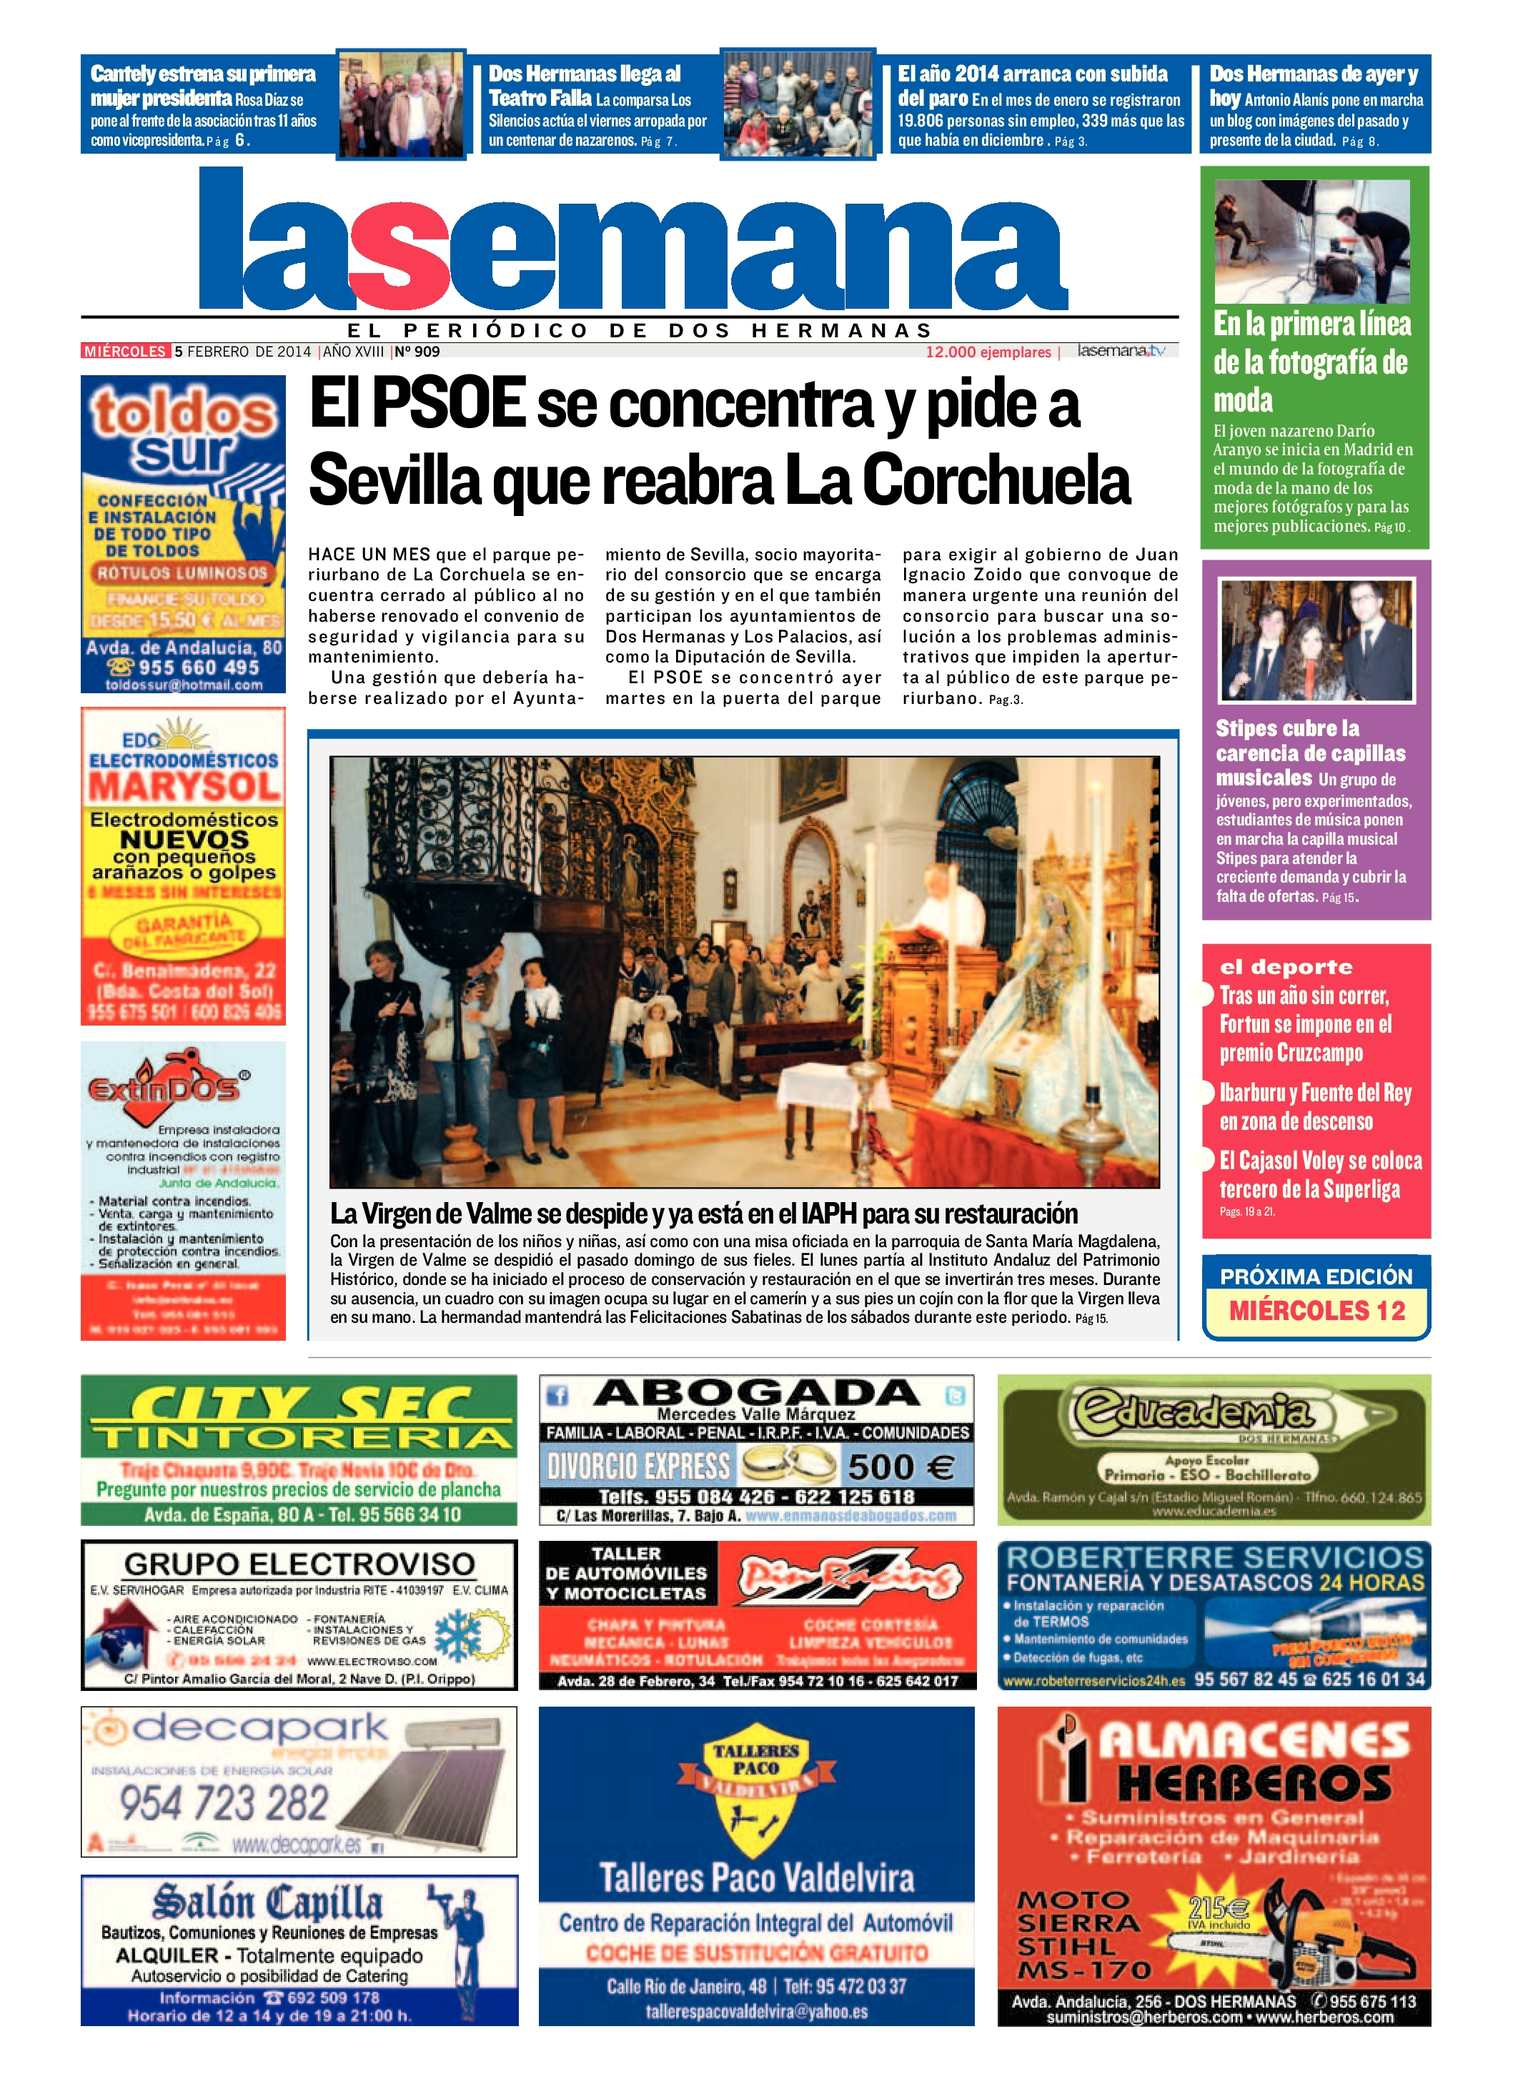 Calaméo - Periódico La Semana de Dos Hermanas Nº 909 f7991a4756538